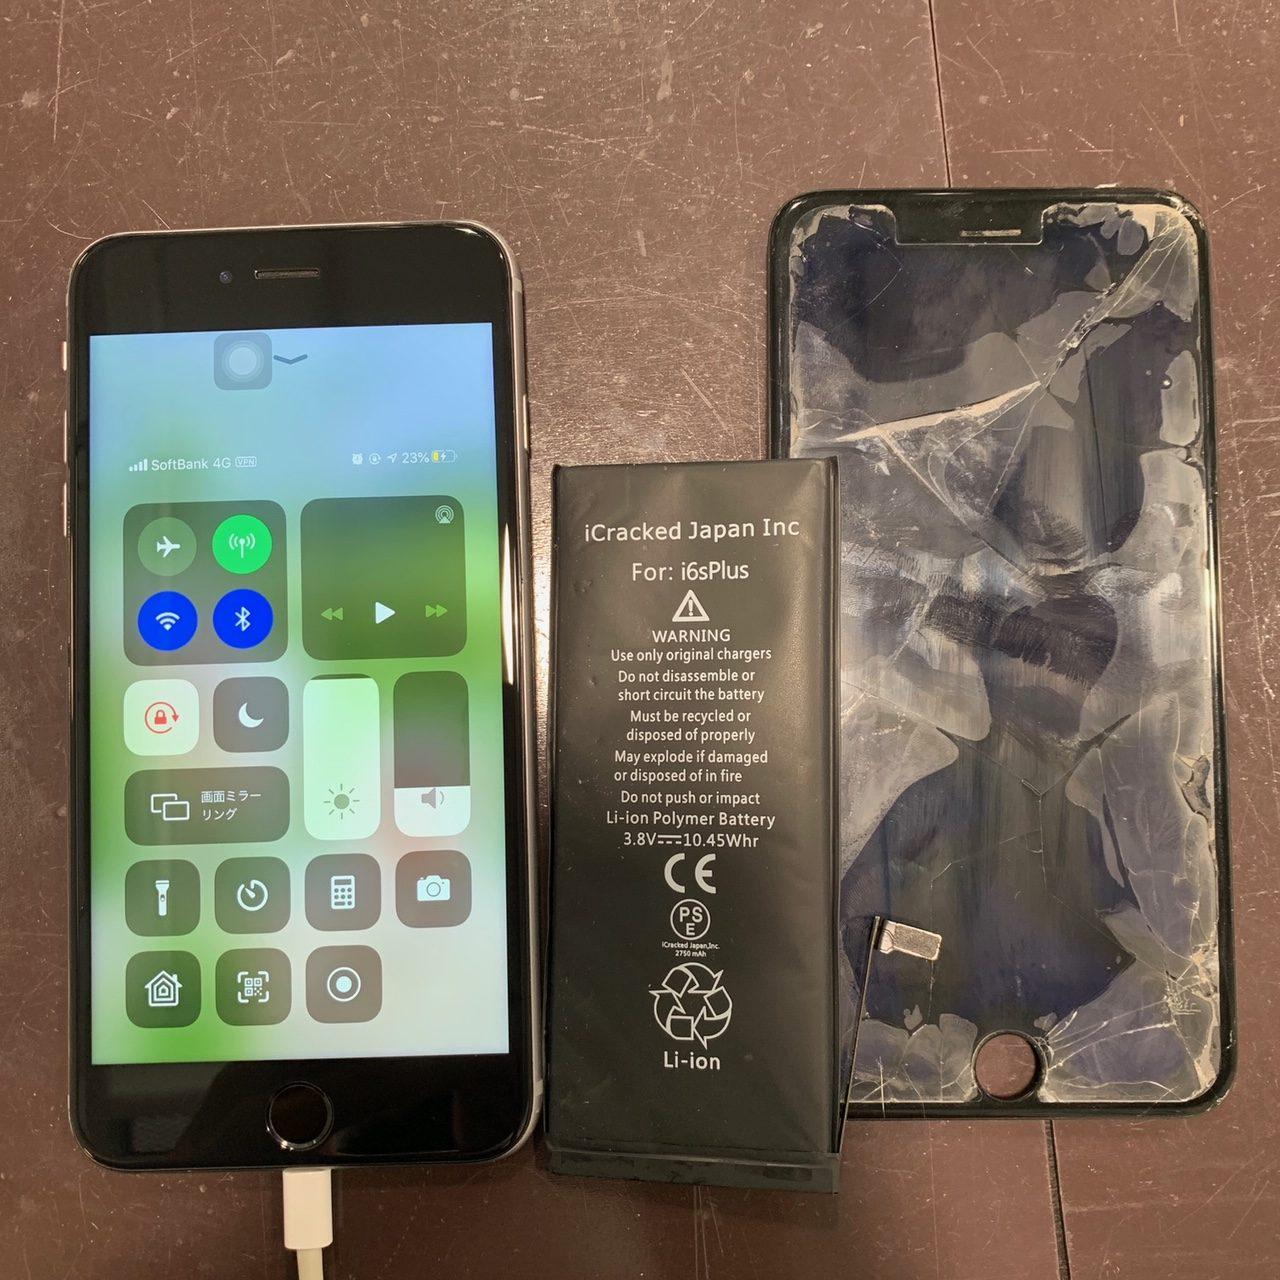 iPhone6s+|バッテリー膨張・画面破損修理|11月12日佐賀県佐賀市にiPhone修理店がオープン!